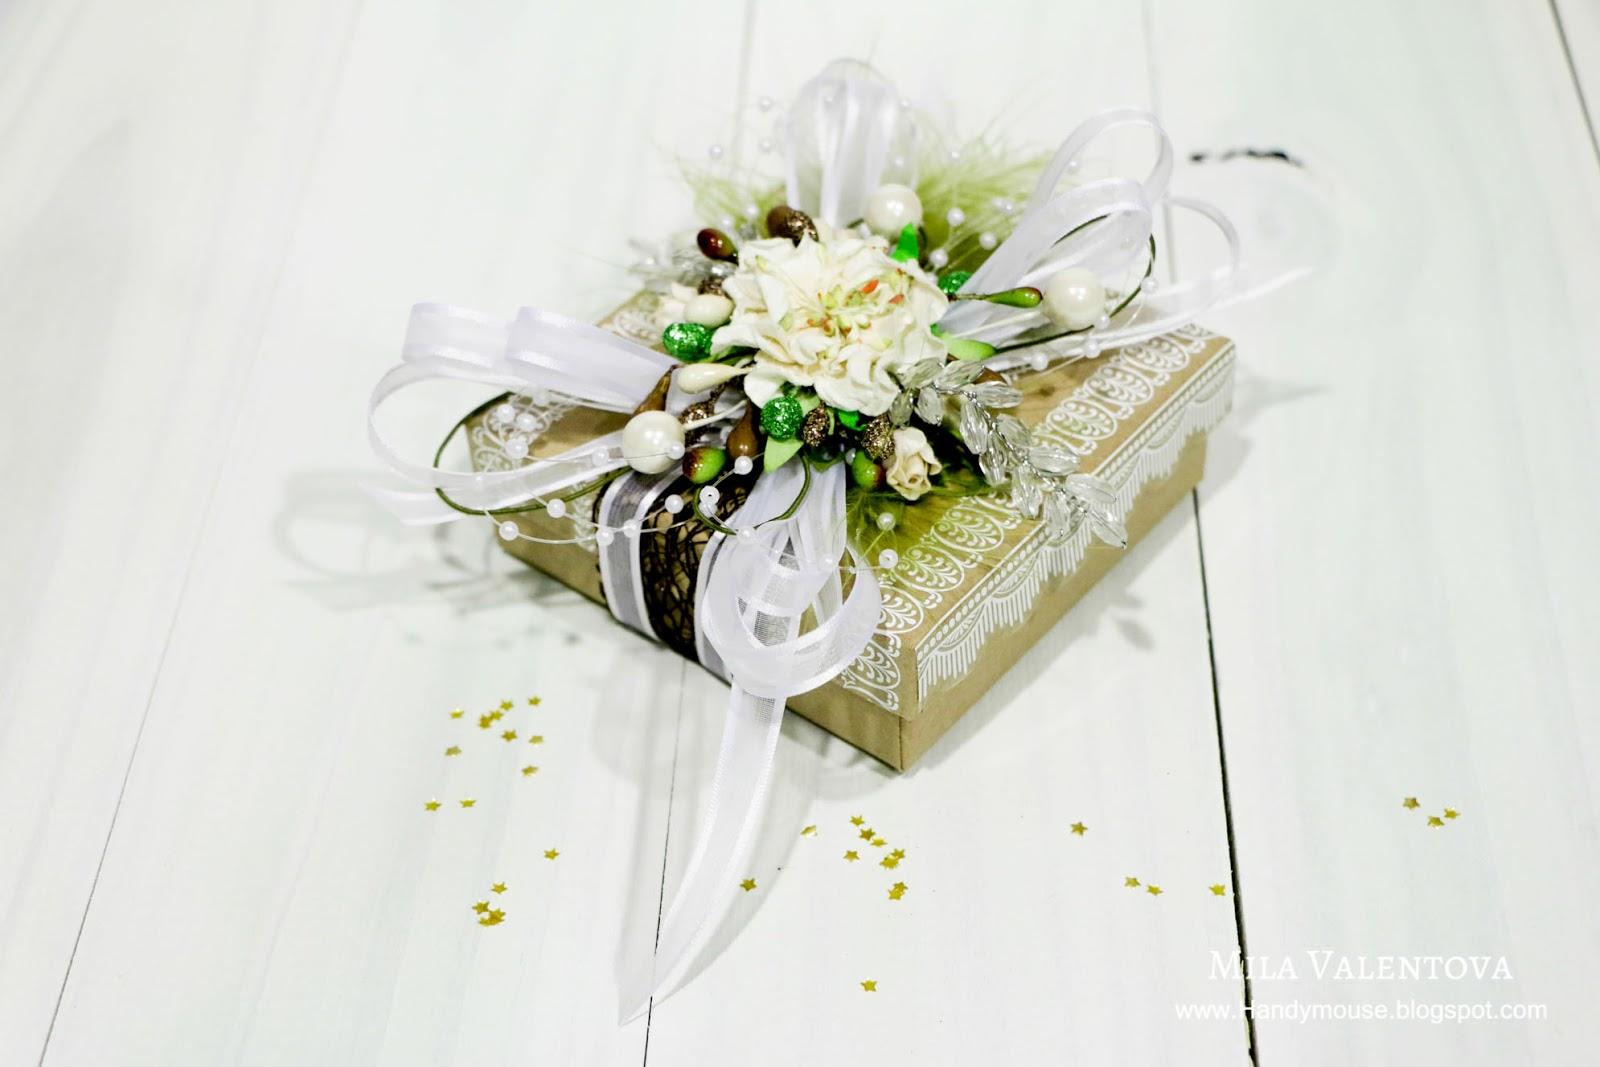 Мастер-класс бонбоньерка на свадьбу